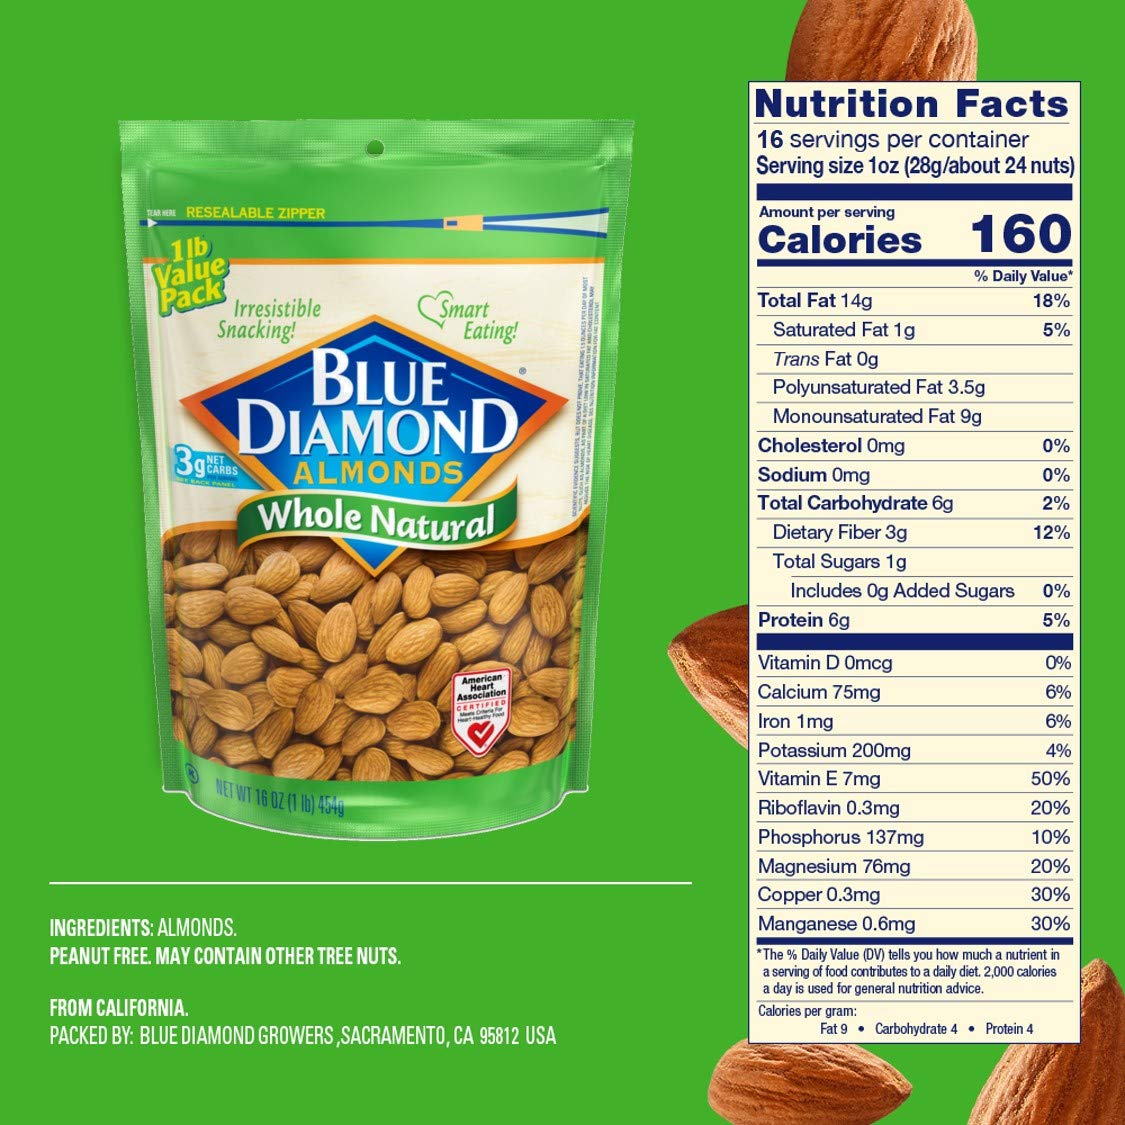 Blue Diamond Almonds, Raw Whole Natural, 16 Ounce by Blue Diamond Almonds (Image #3)